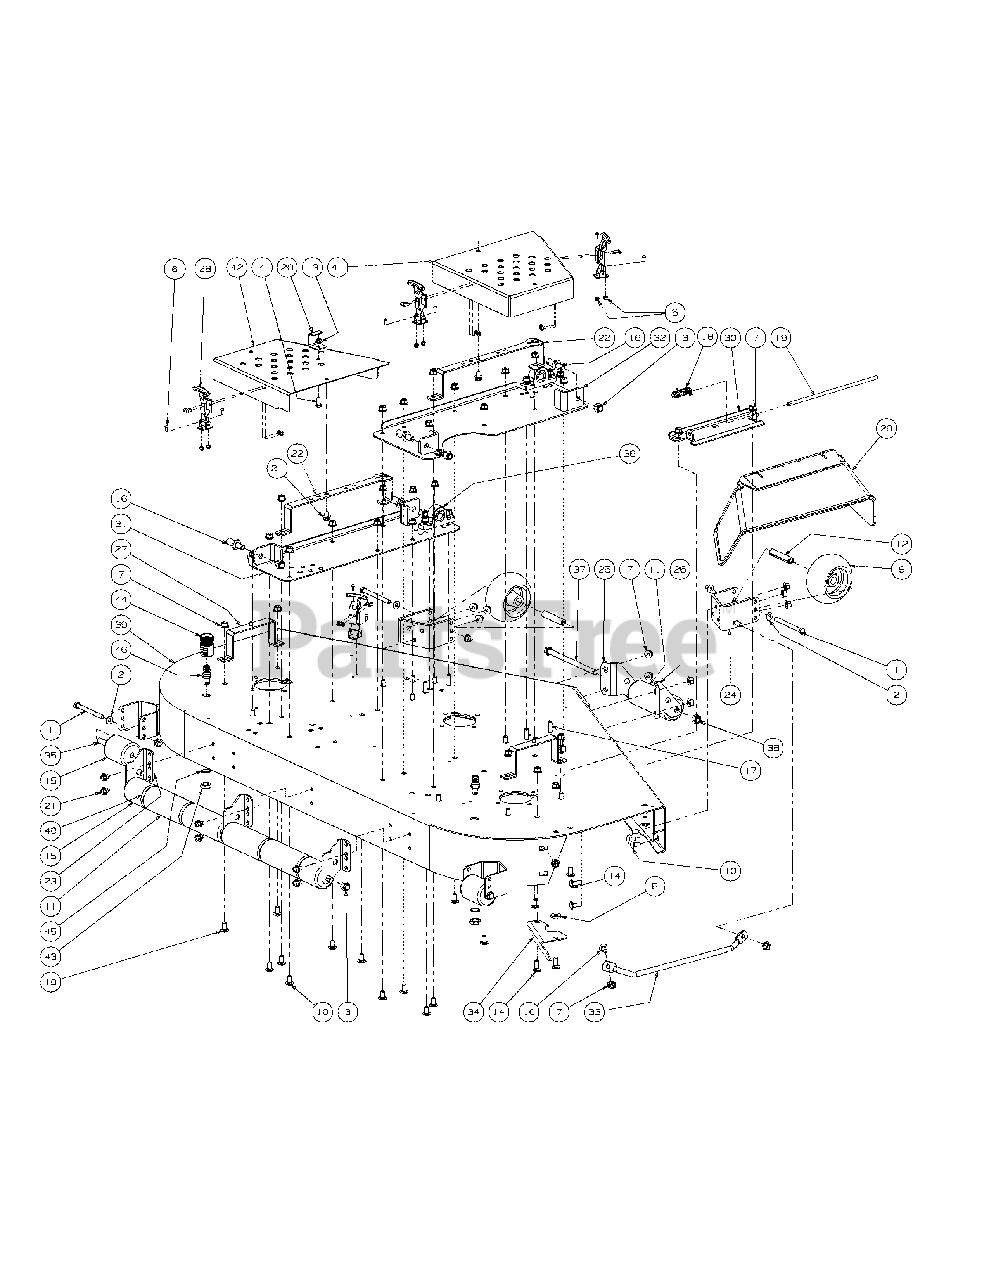 Diagram  Wiring Diagram For Cub Cadet Tank Full Version